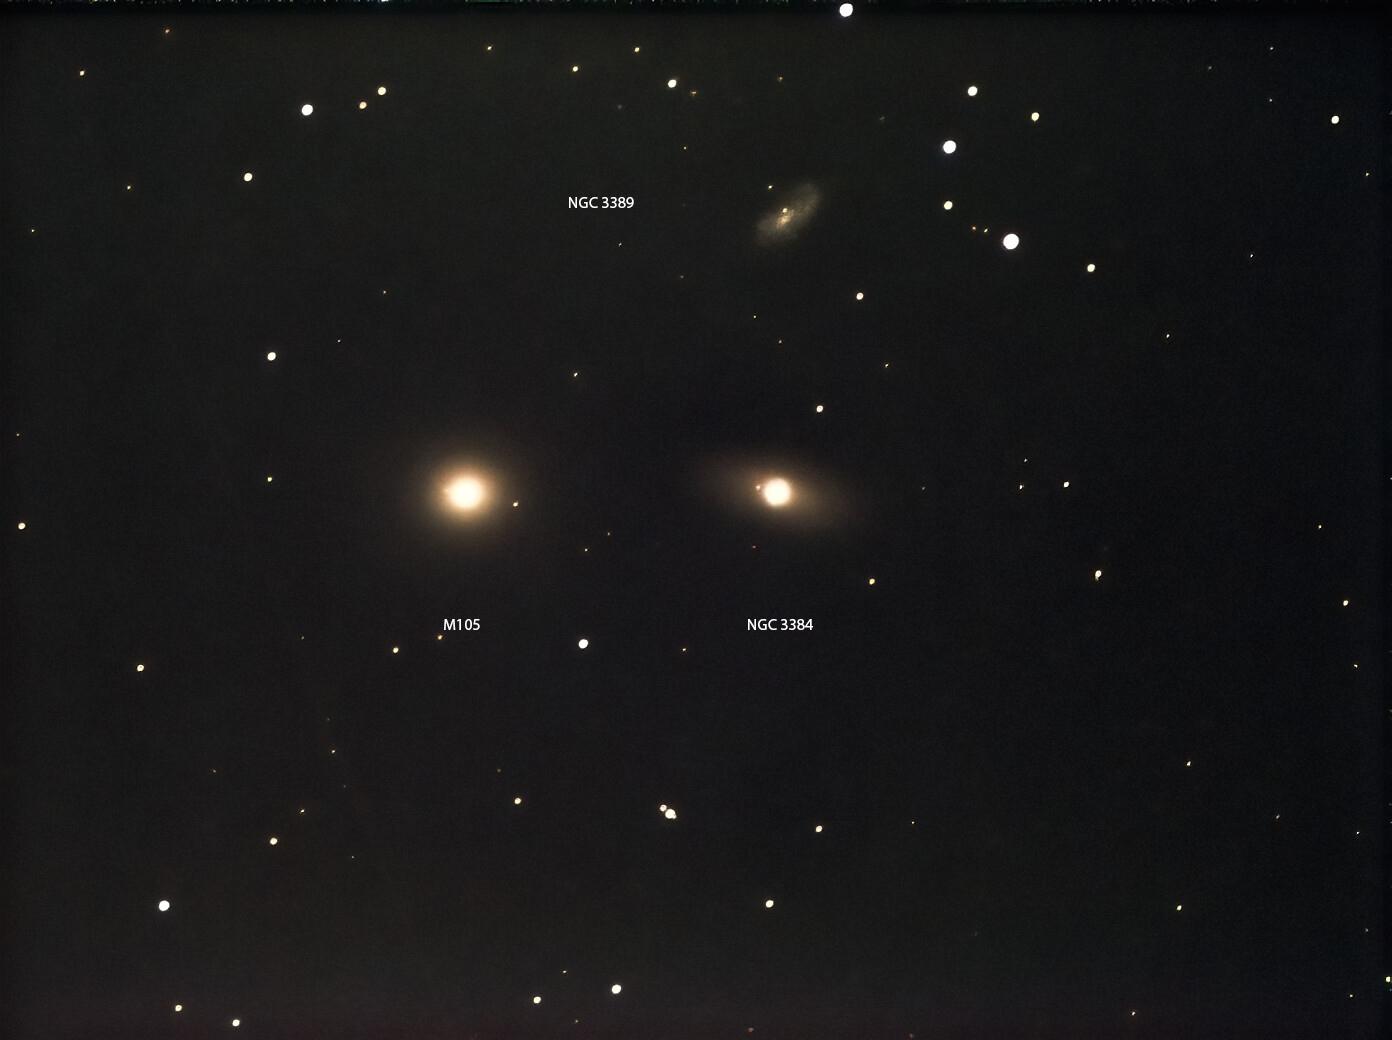 M105 Andrew Farrow 16.03.21 30secs exps for 1120secs total Lots of light pollution ES127mm APO, Atik Infinity